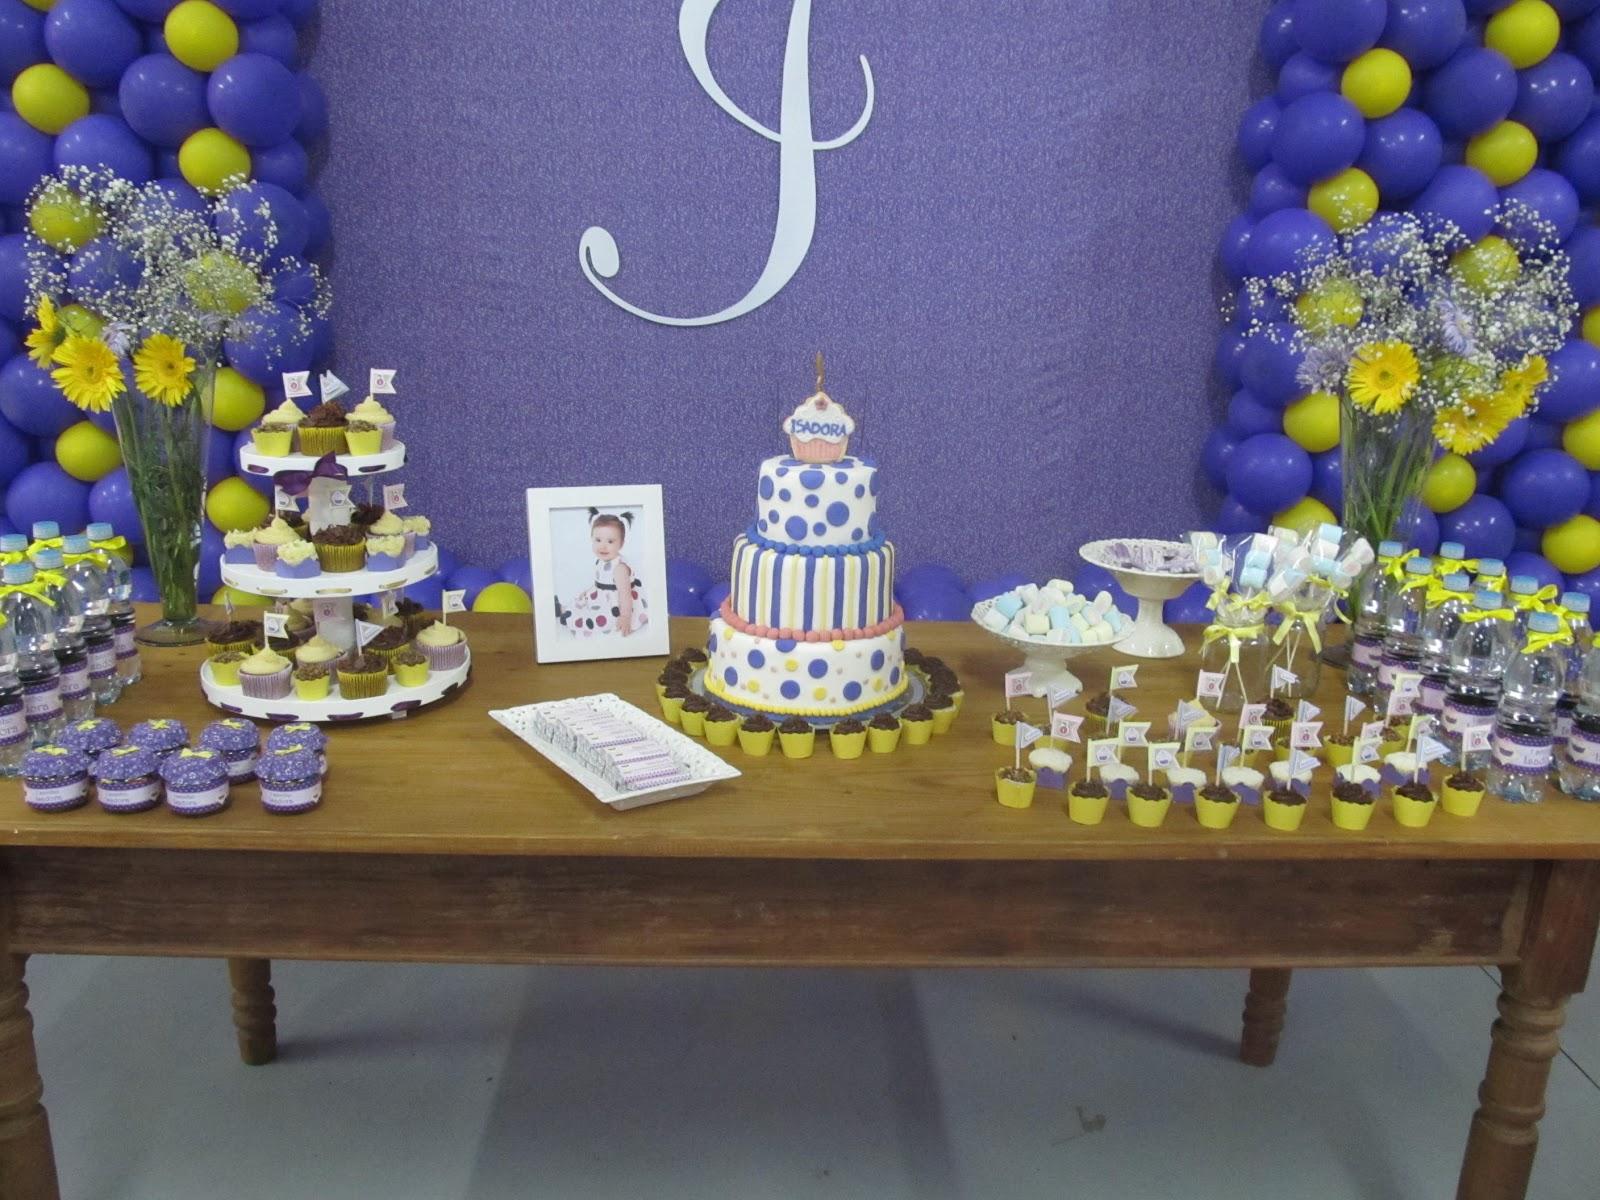 lilás e amarelo super diferente e delicado e com deliciosos cupcakes